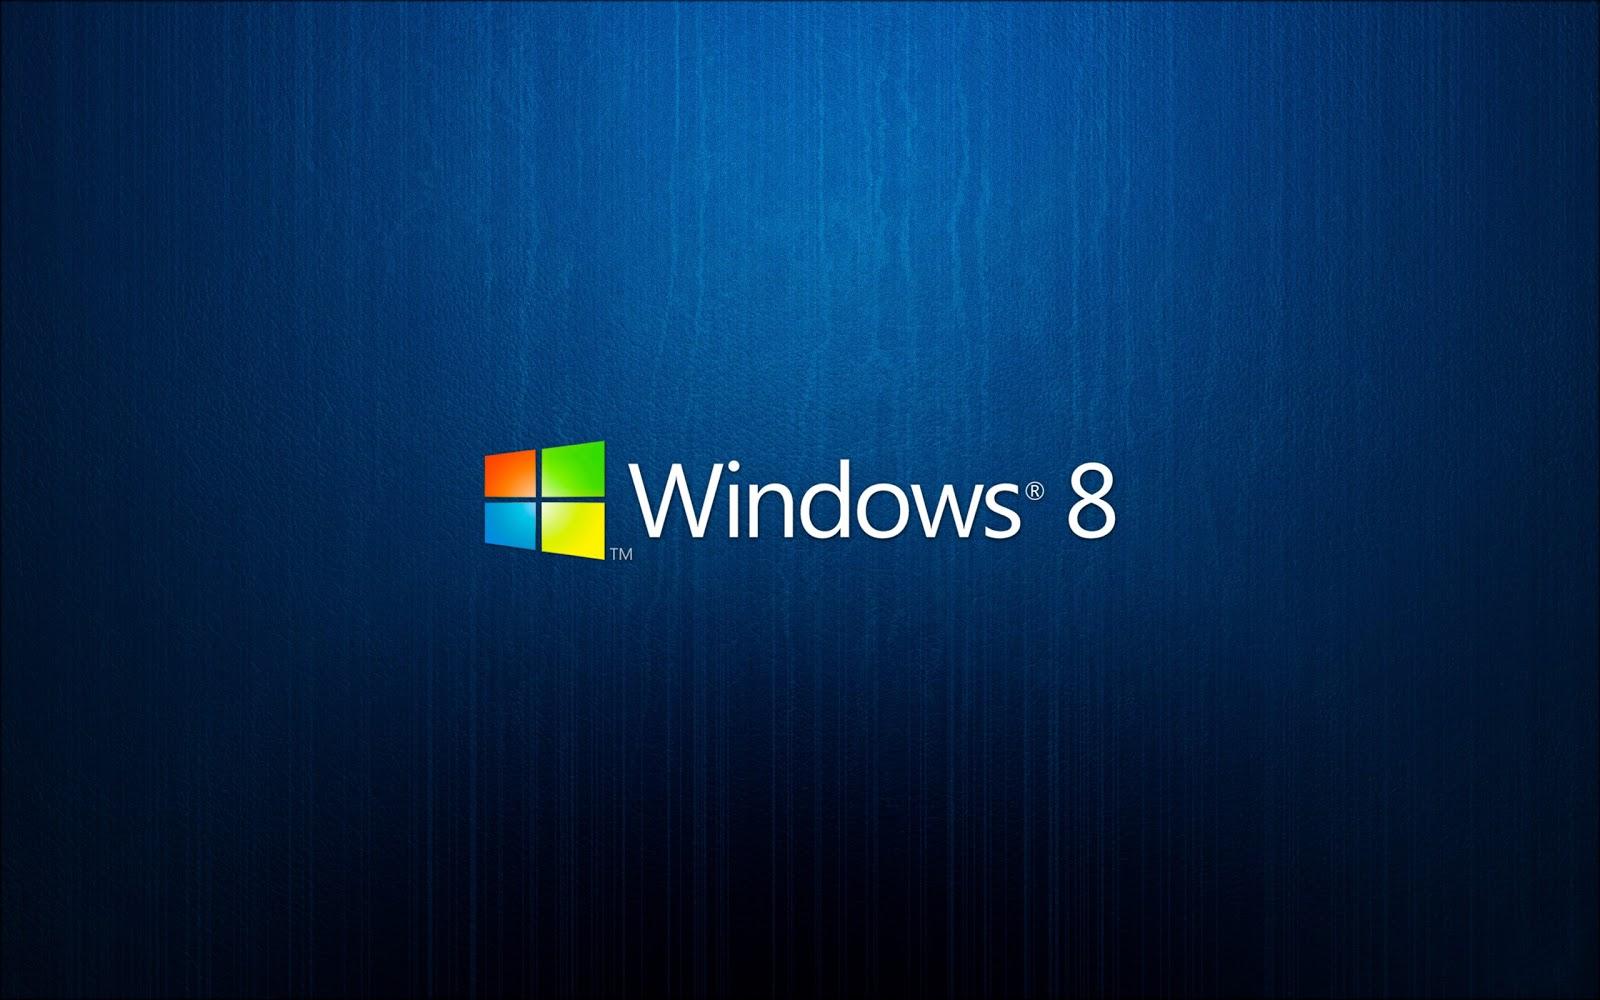 download.microsoft.com windows 8